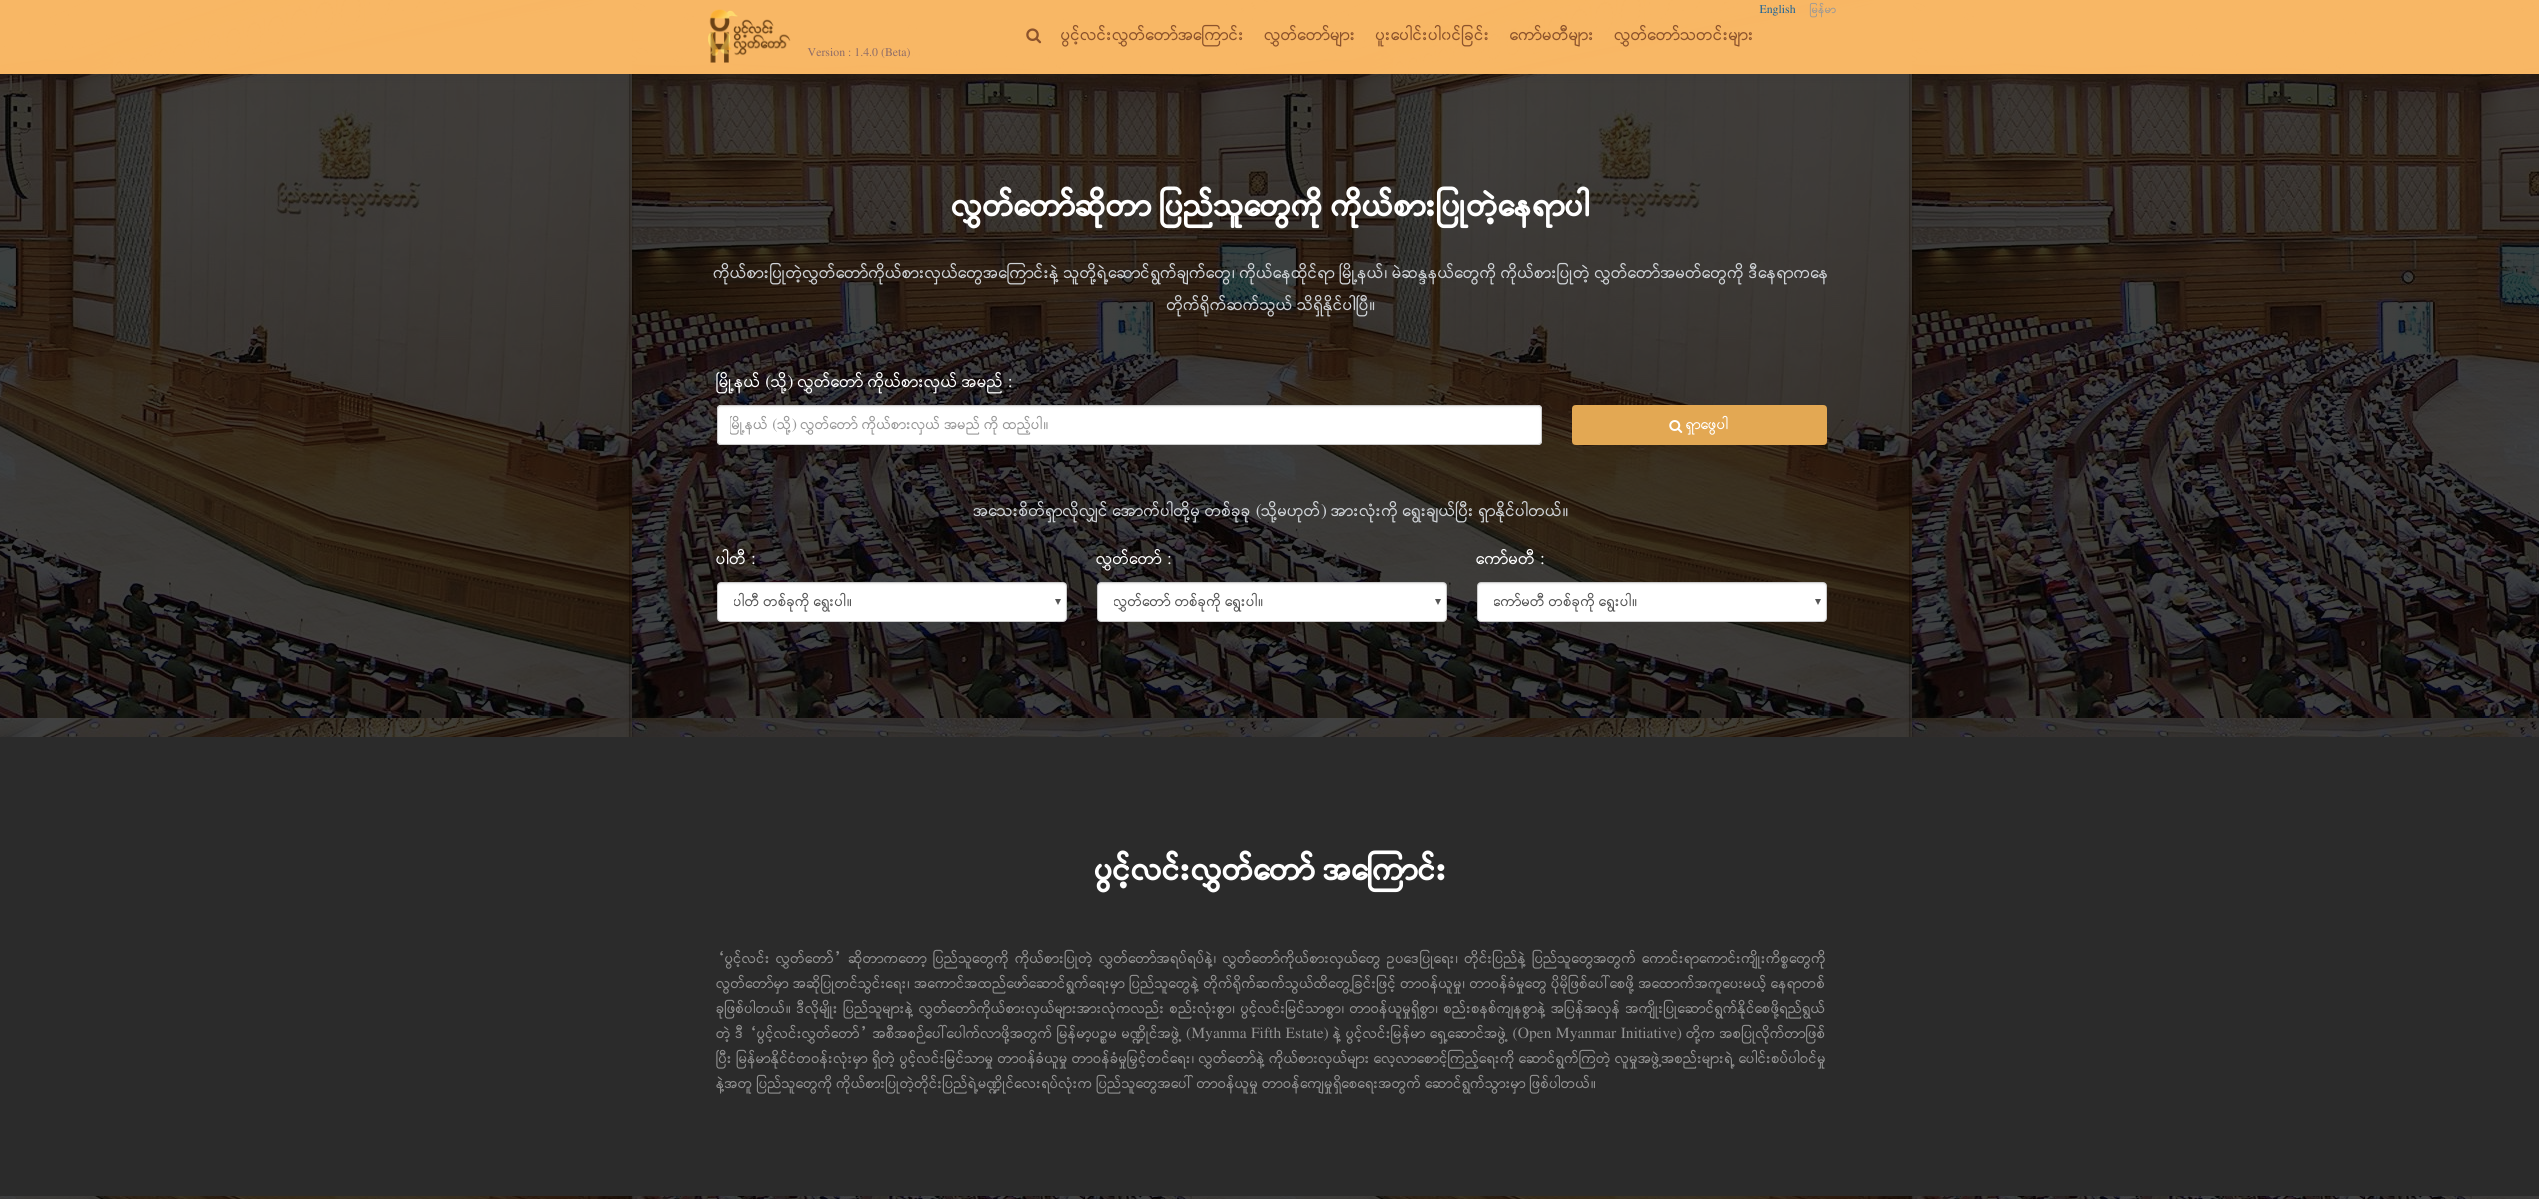 OpenHluttaw Website